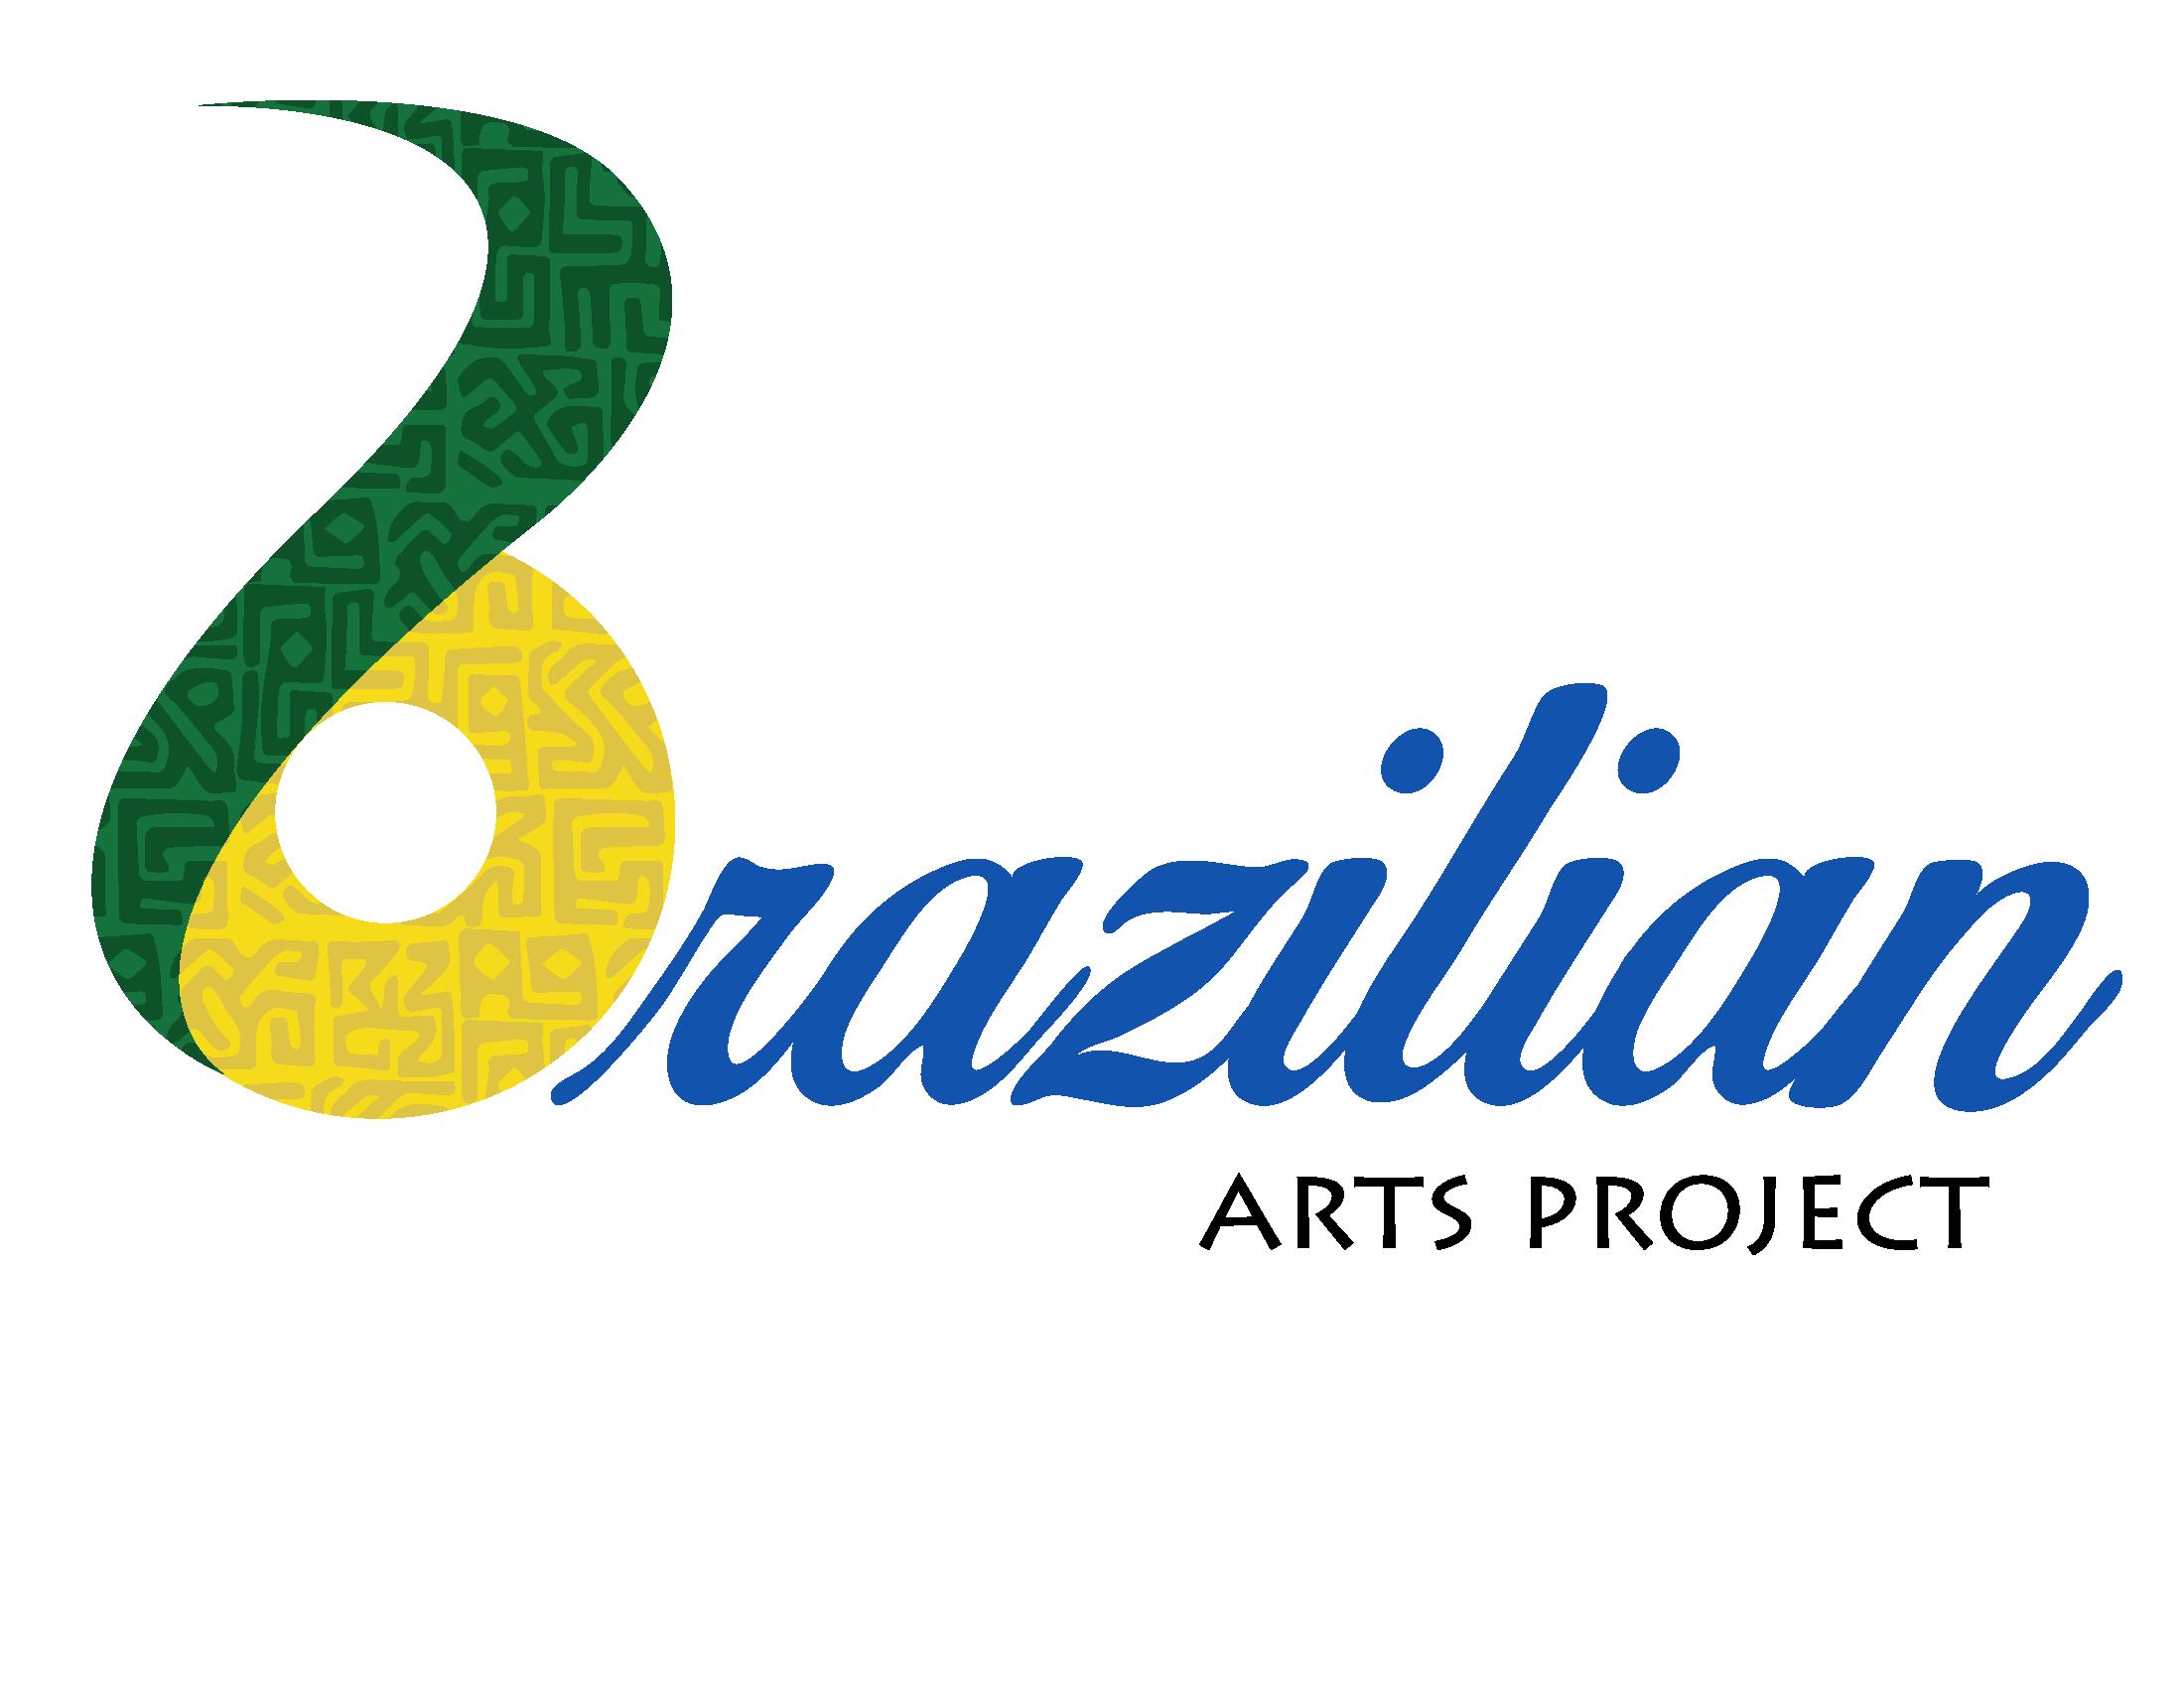 Contact Us - T : 980-729-2495ncbrazilianartsproject@gmail.com